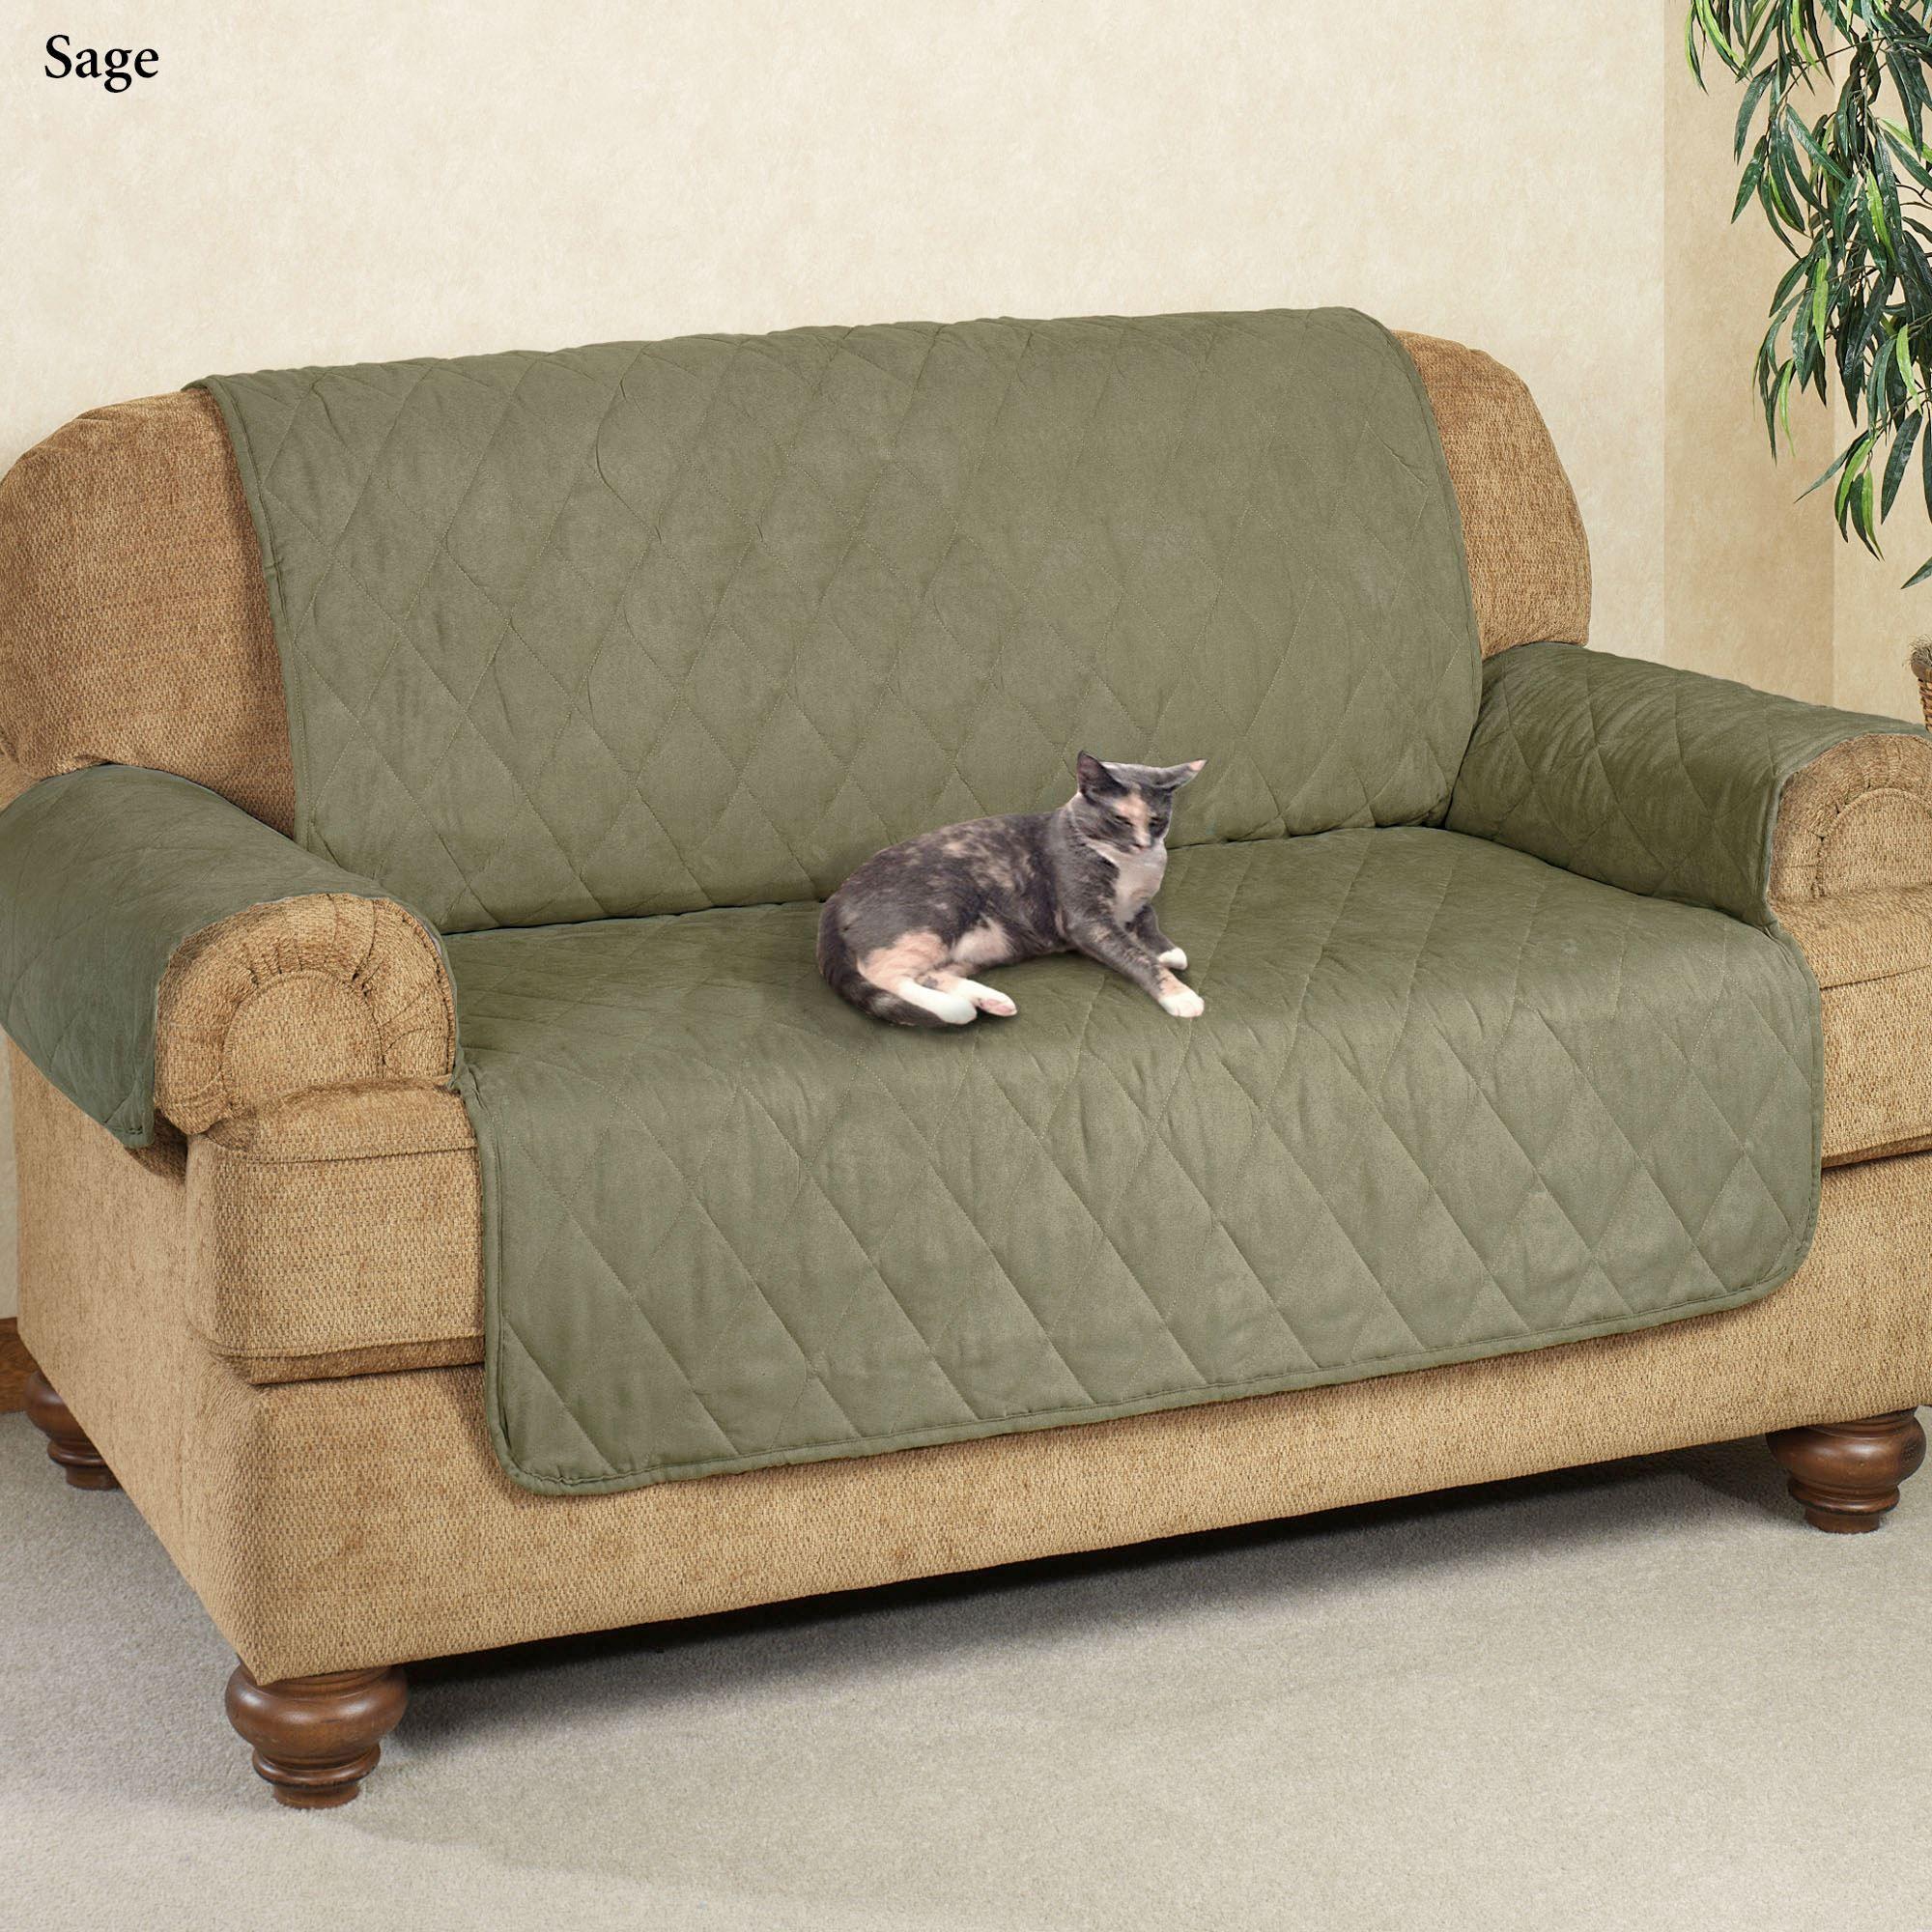 Stupendous Mason Quilted Microfiber Furniture Protectors Machost Co Dining Chair Design Ideas Machostcouk